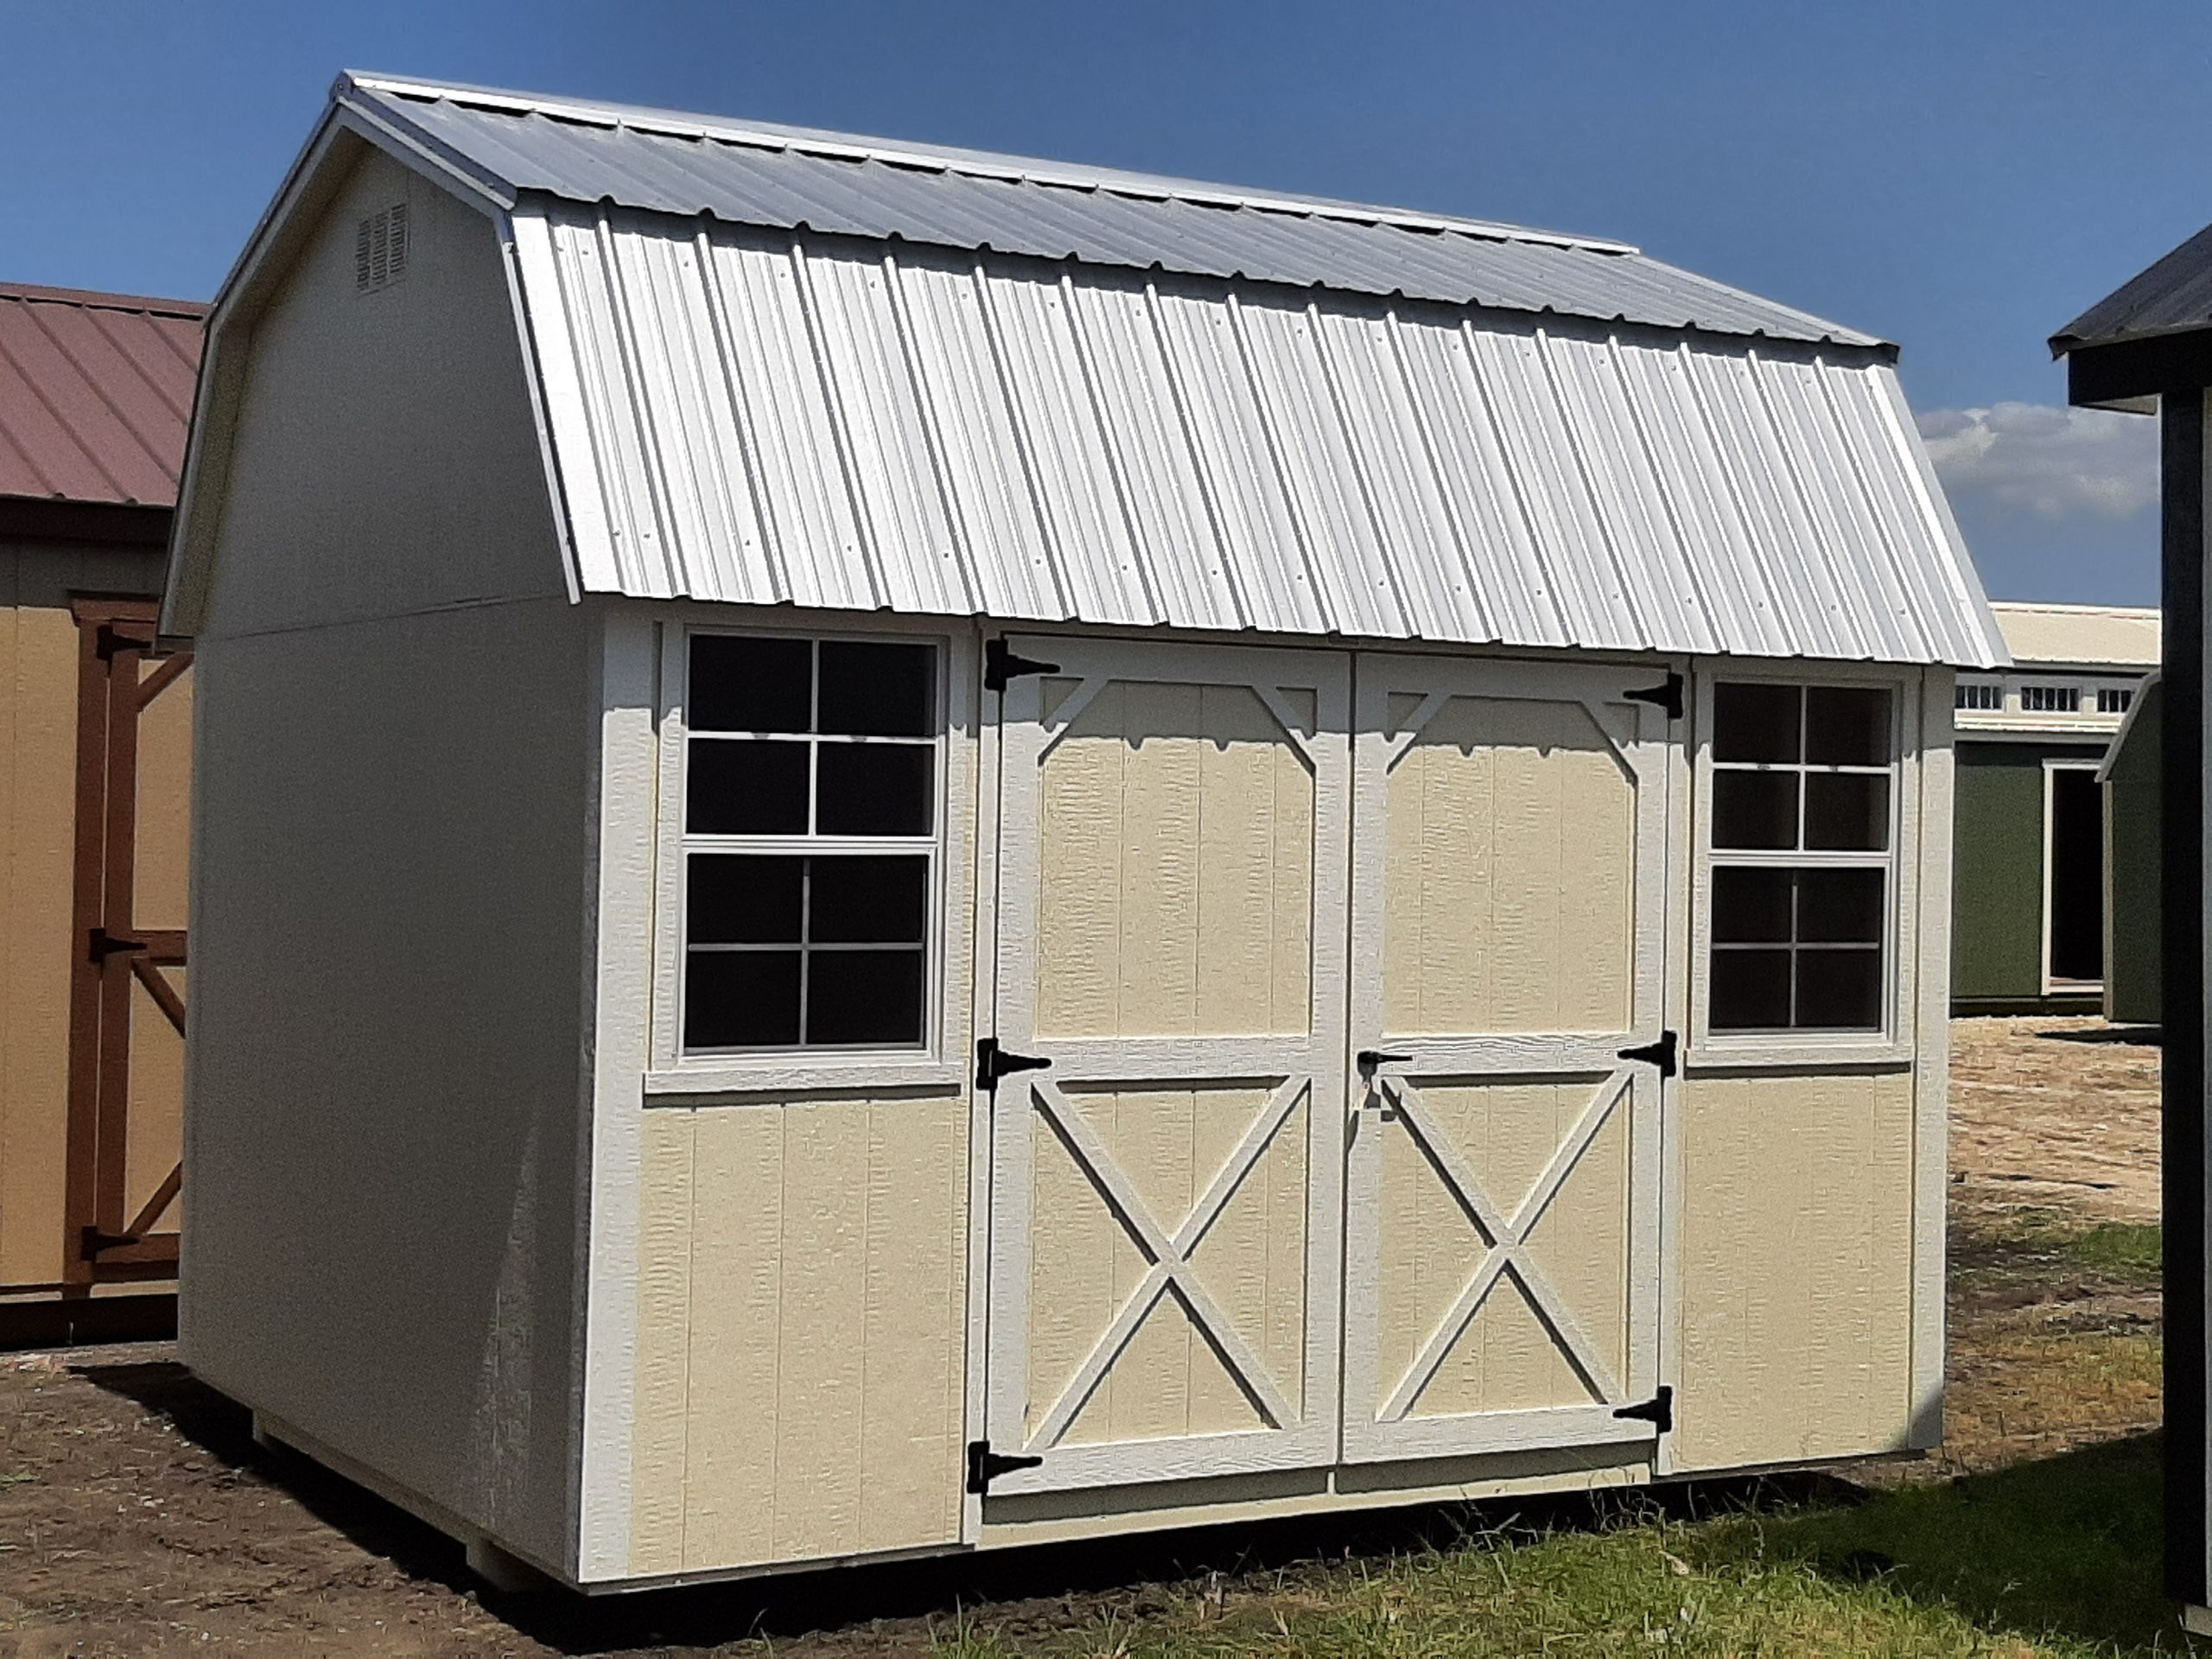 10x12 Elite Lofted Barn #2208 Image